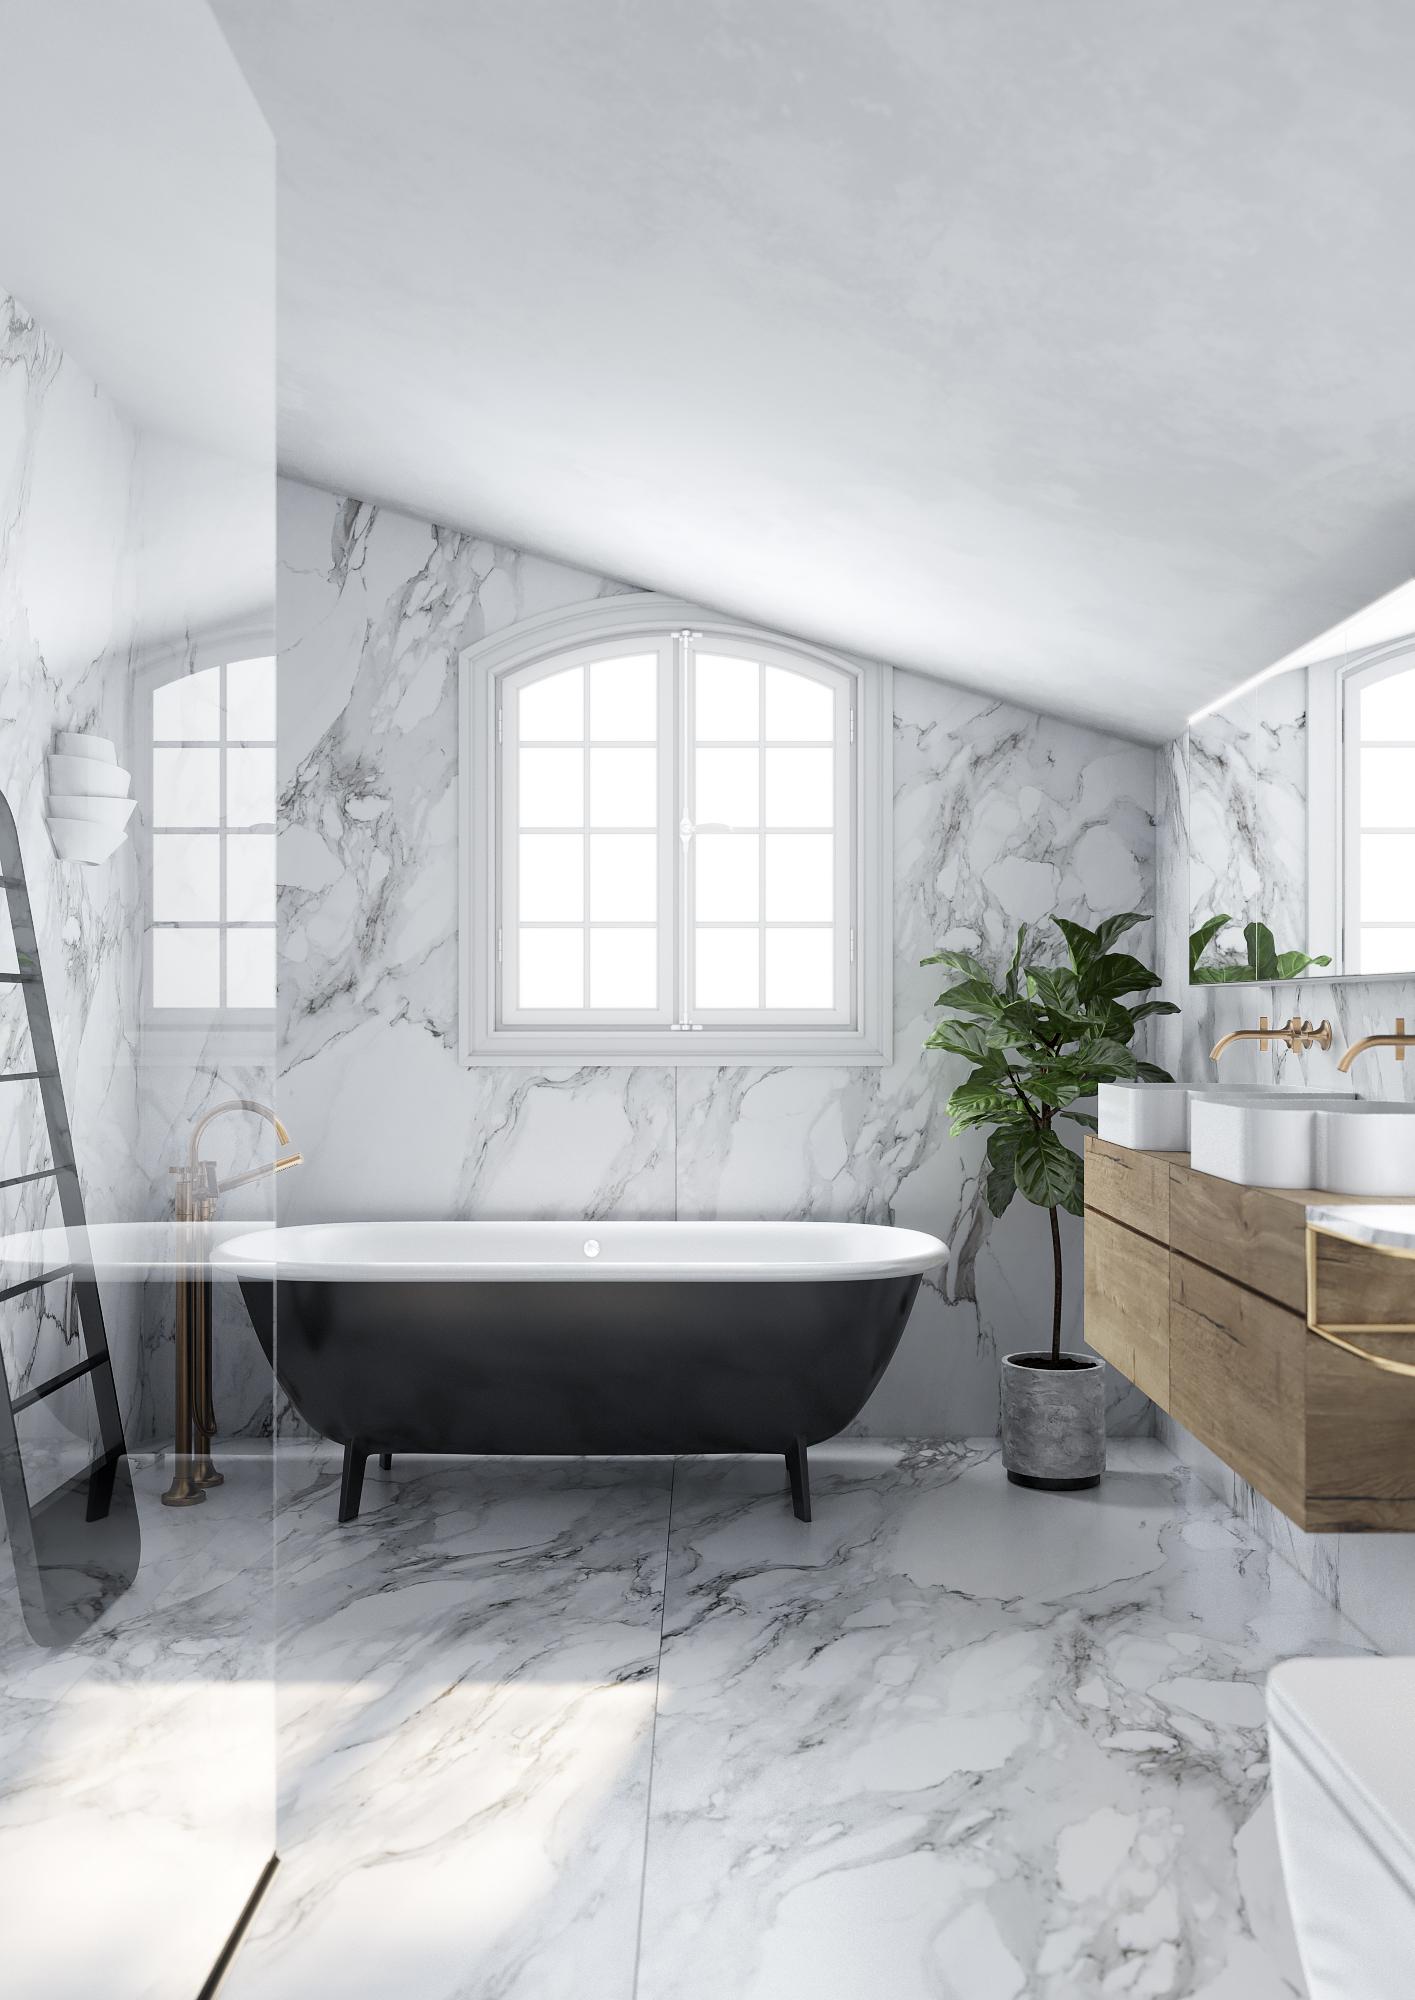 Bathroom_Second_View02_27.07.2019.jpg